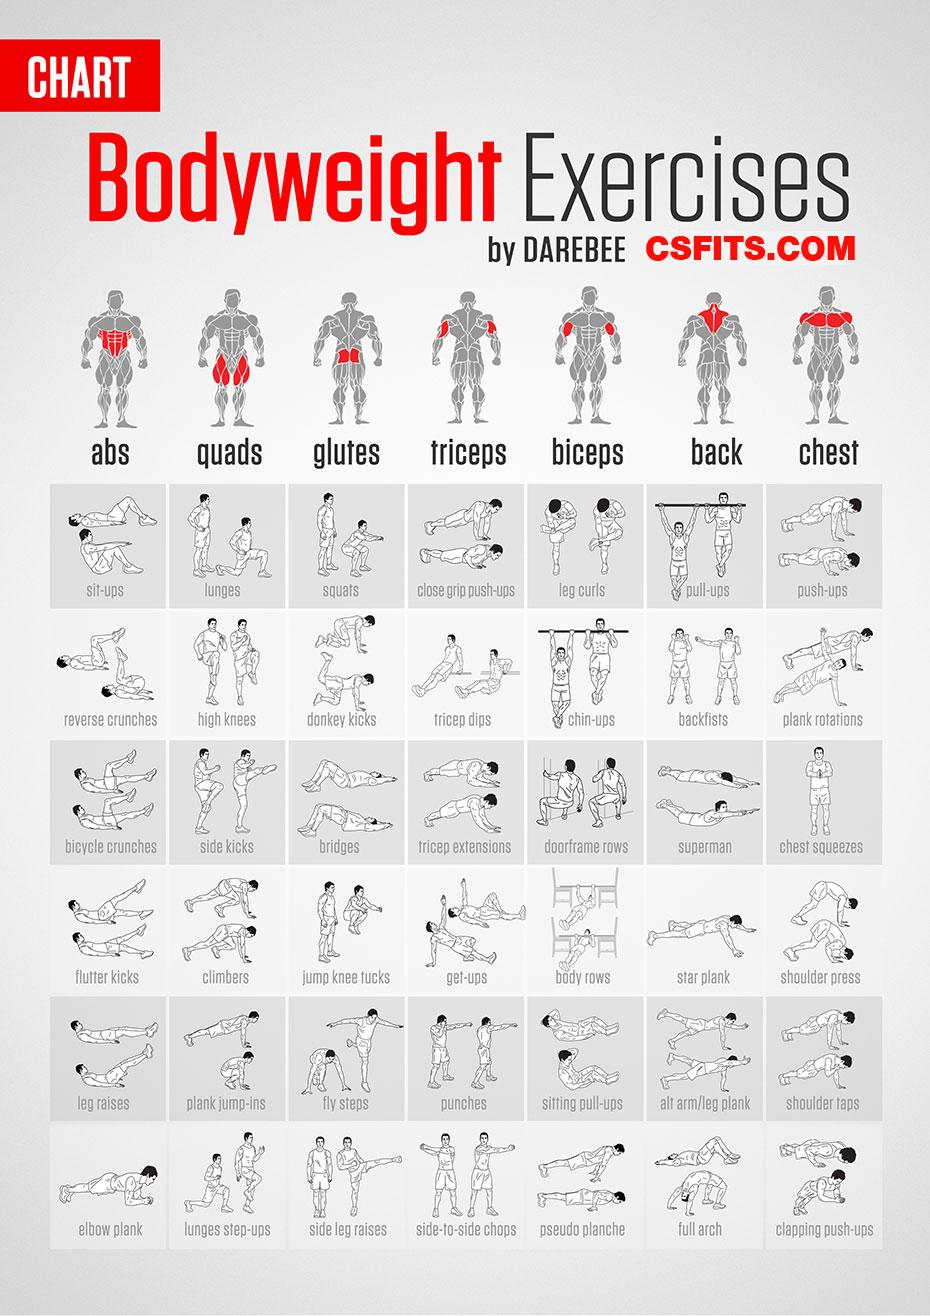 Parunchai Kochseni No.8 Bodyweight-exercises-chart%2Bcopy